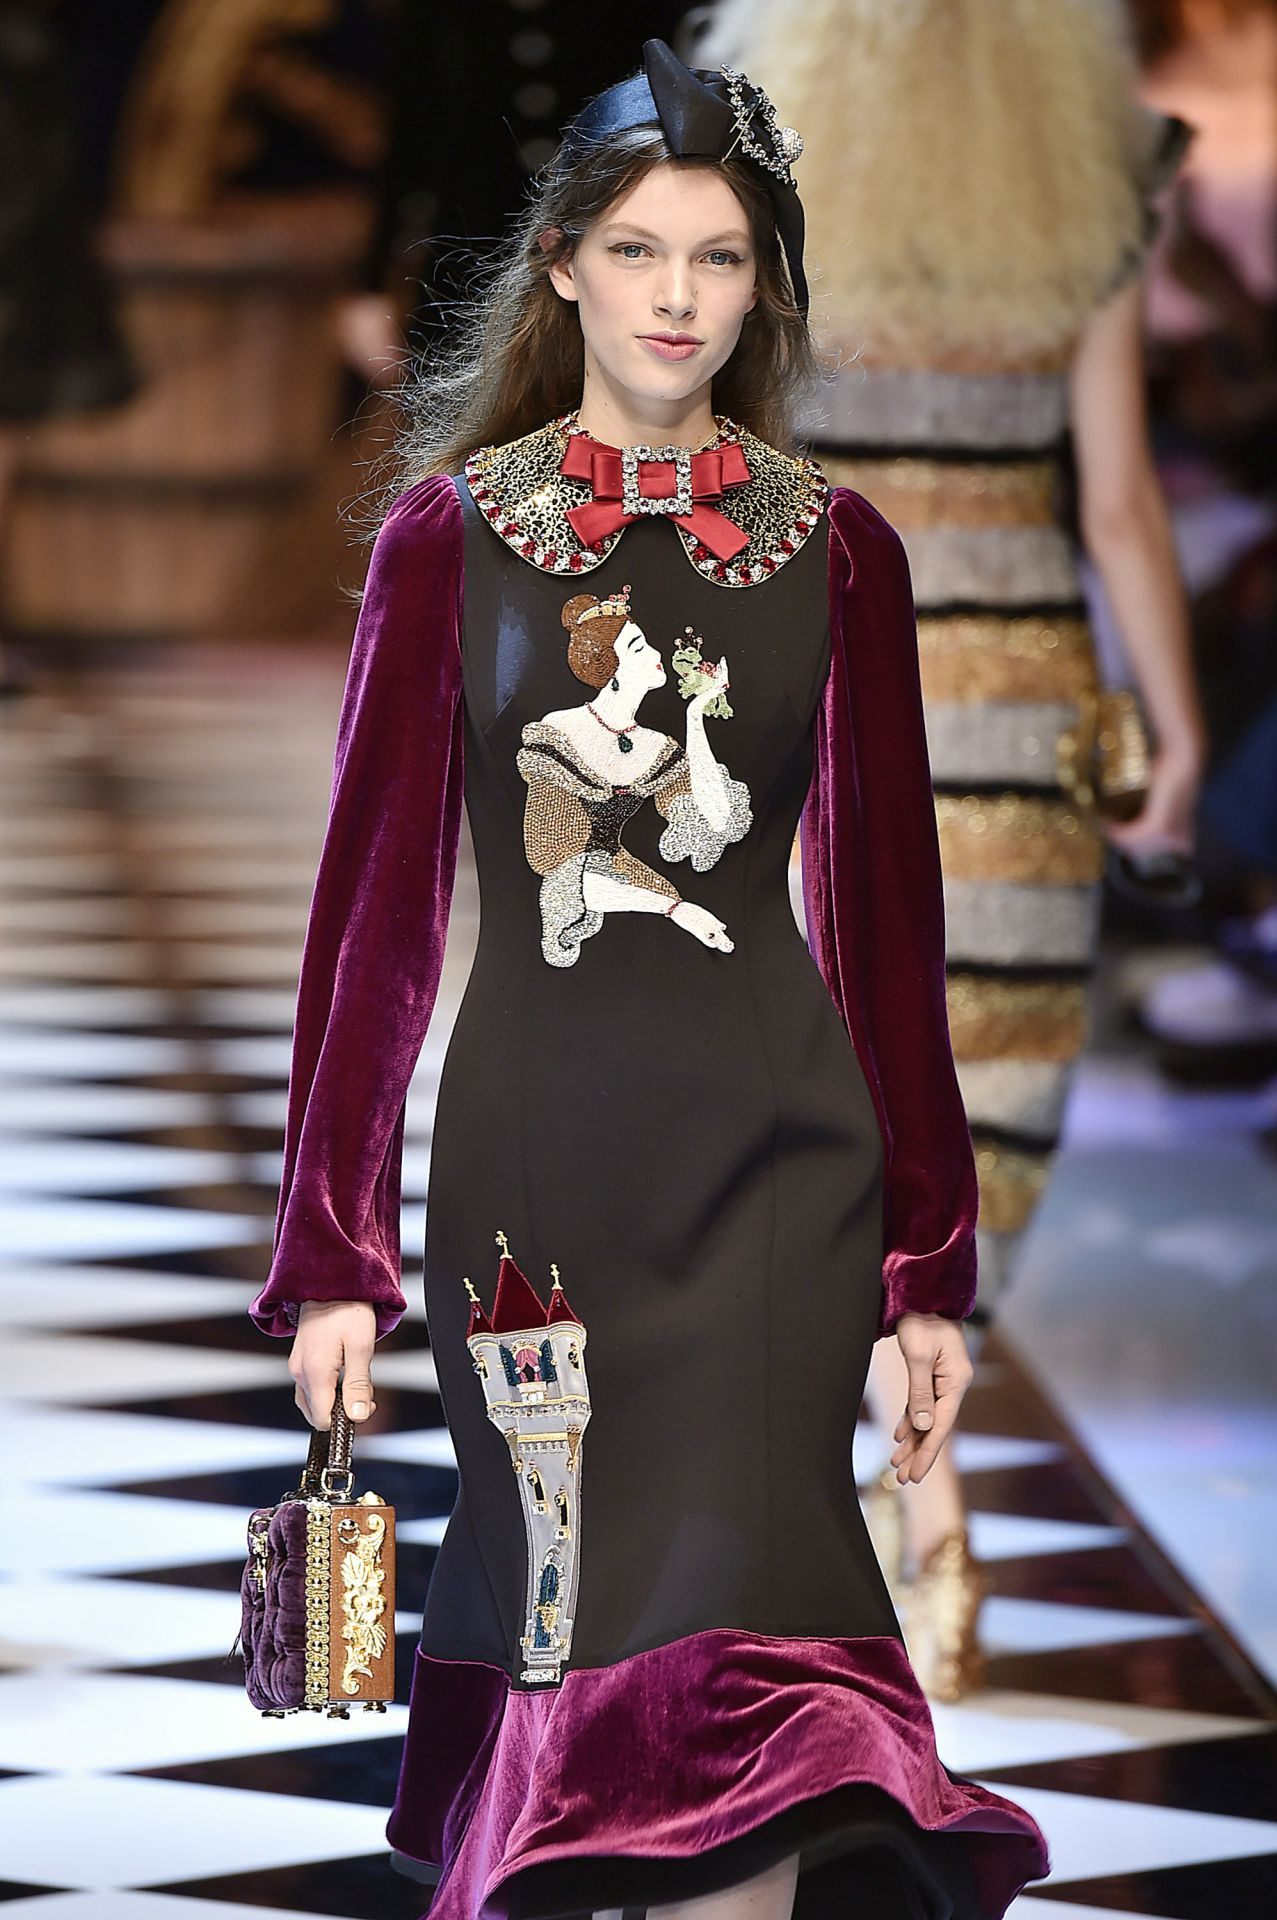 2. kép: Dolce & Gabbana 2016 ősz/tél (Fotó: Catwalking/Getty Images)